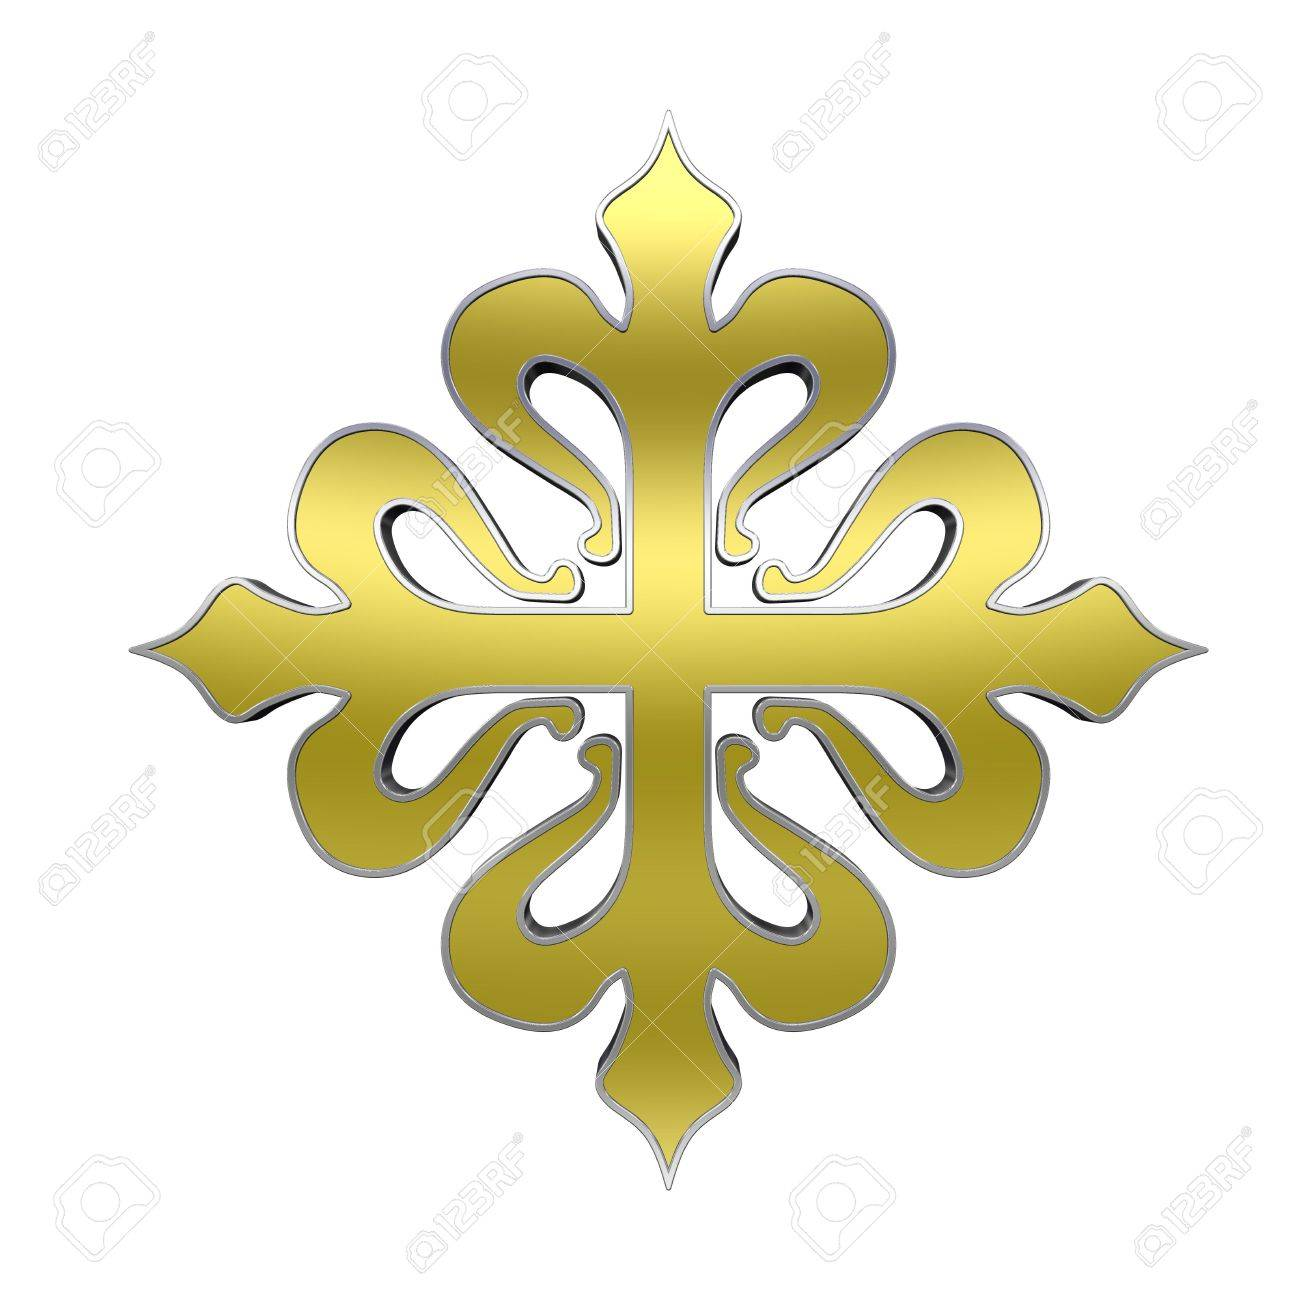 5164247-The-cross-of-Calatrava-Gold-with